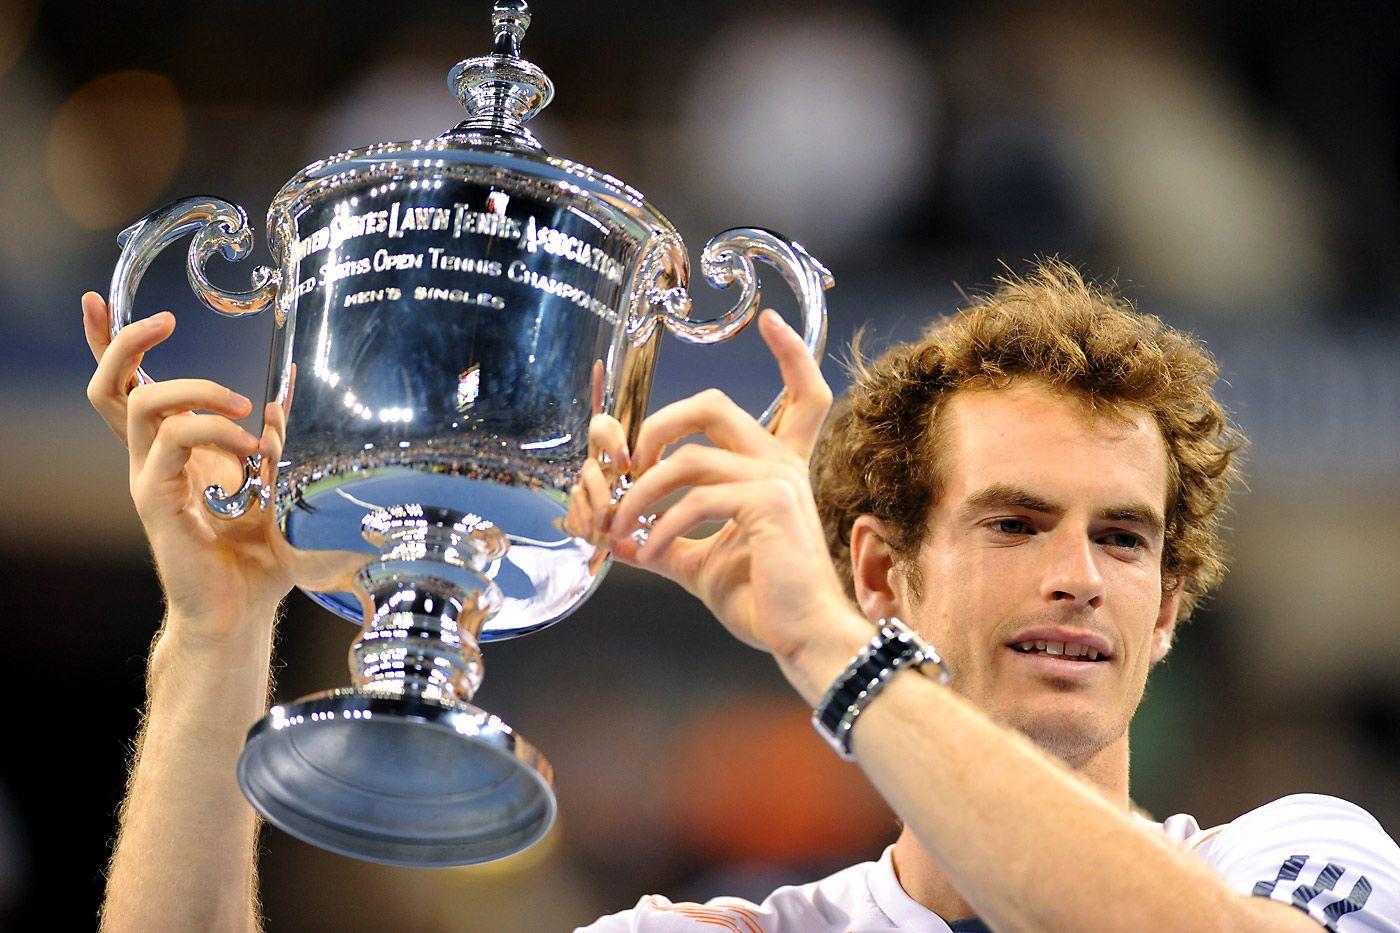 2012 US Open Men's Singles Champion Andy Murray. - Rob Loud/USTA